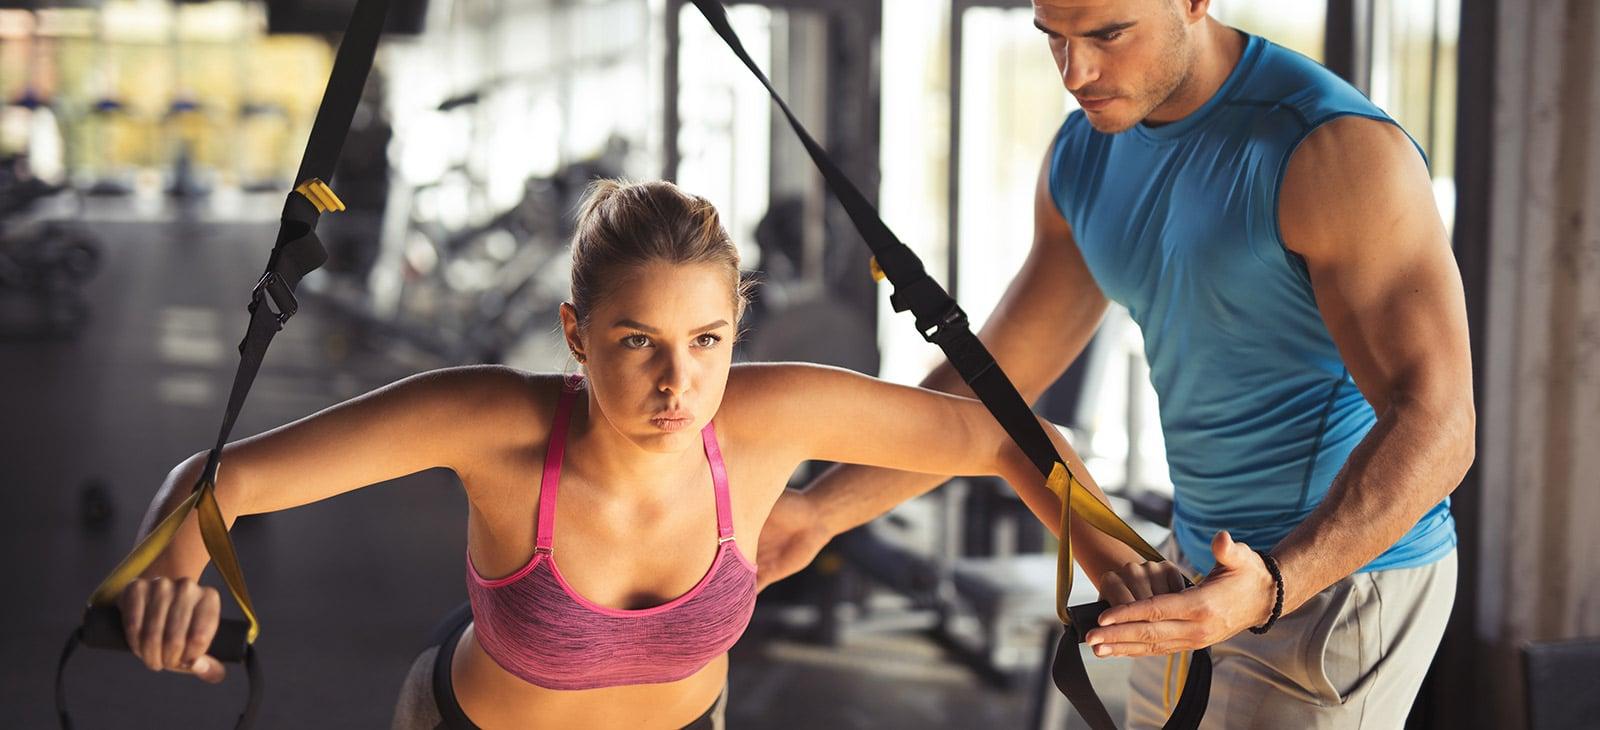 Frau trainiert mit TRX Bändern